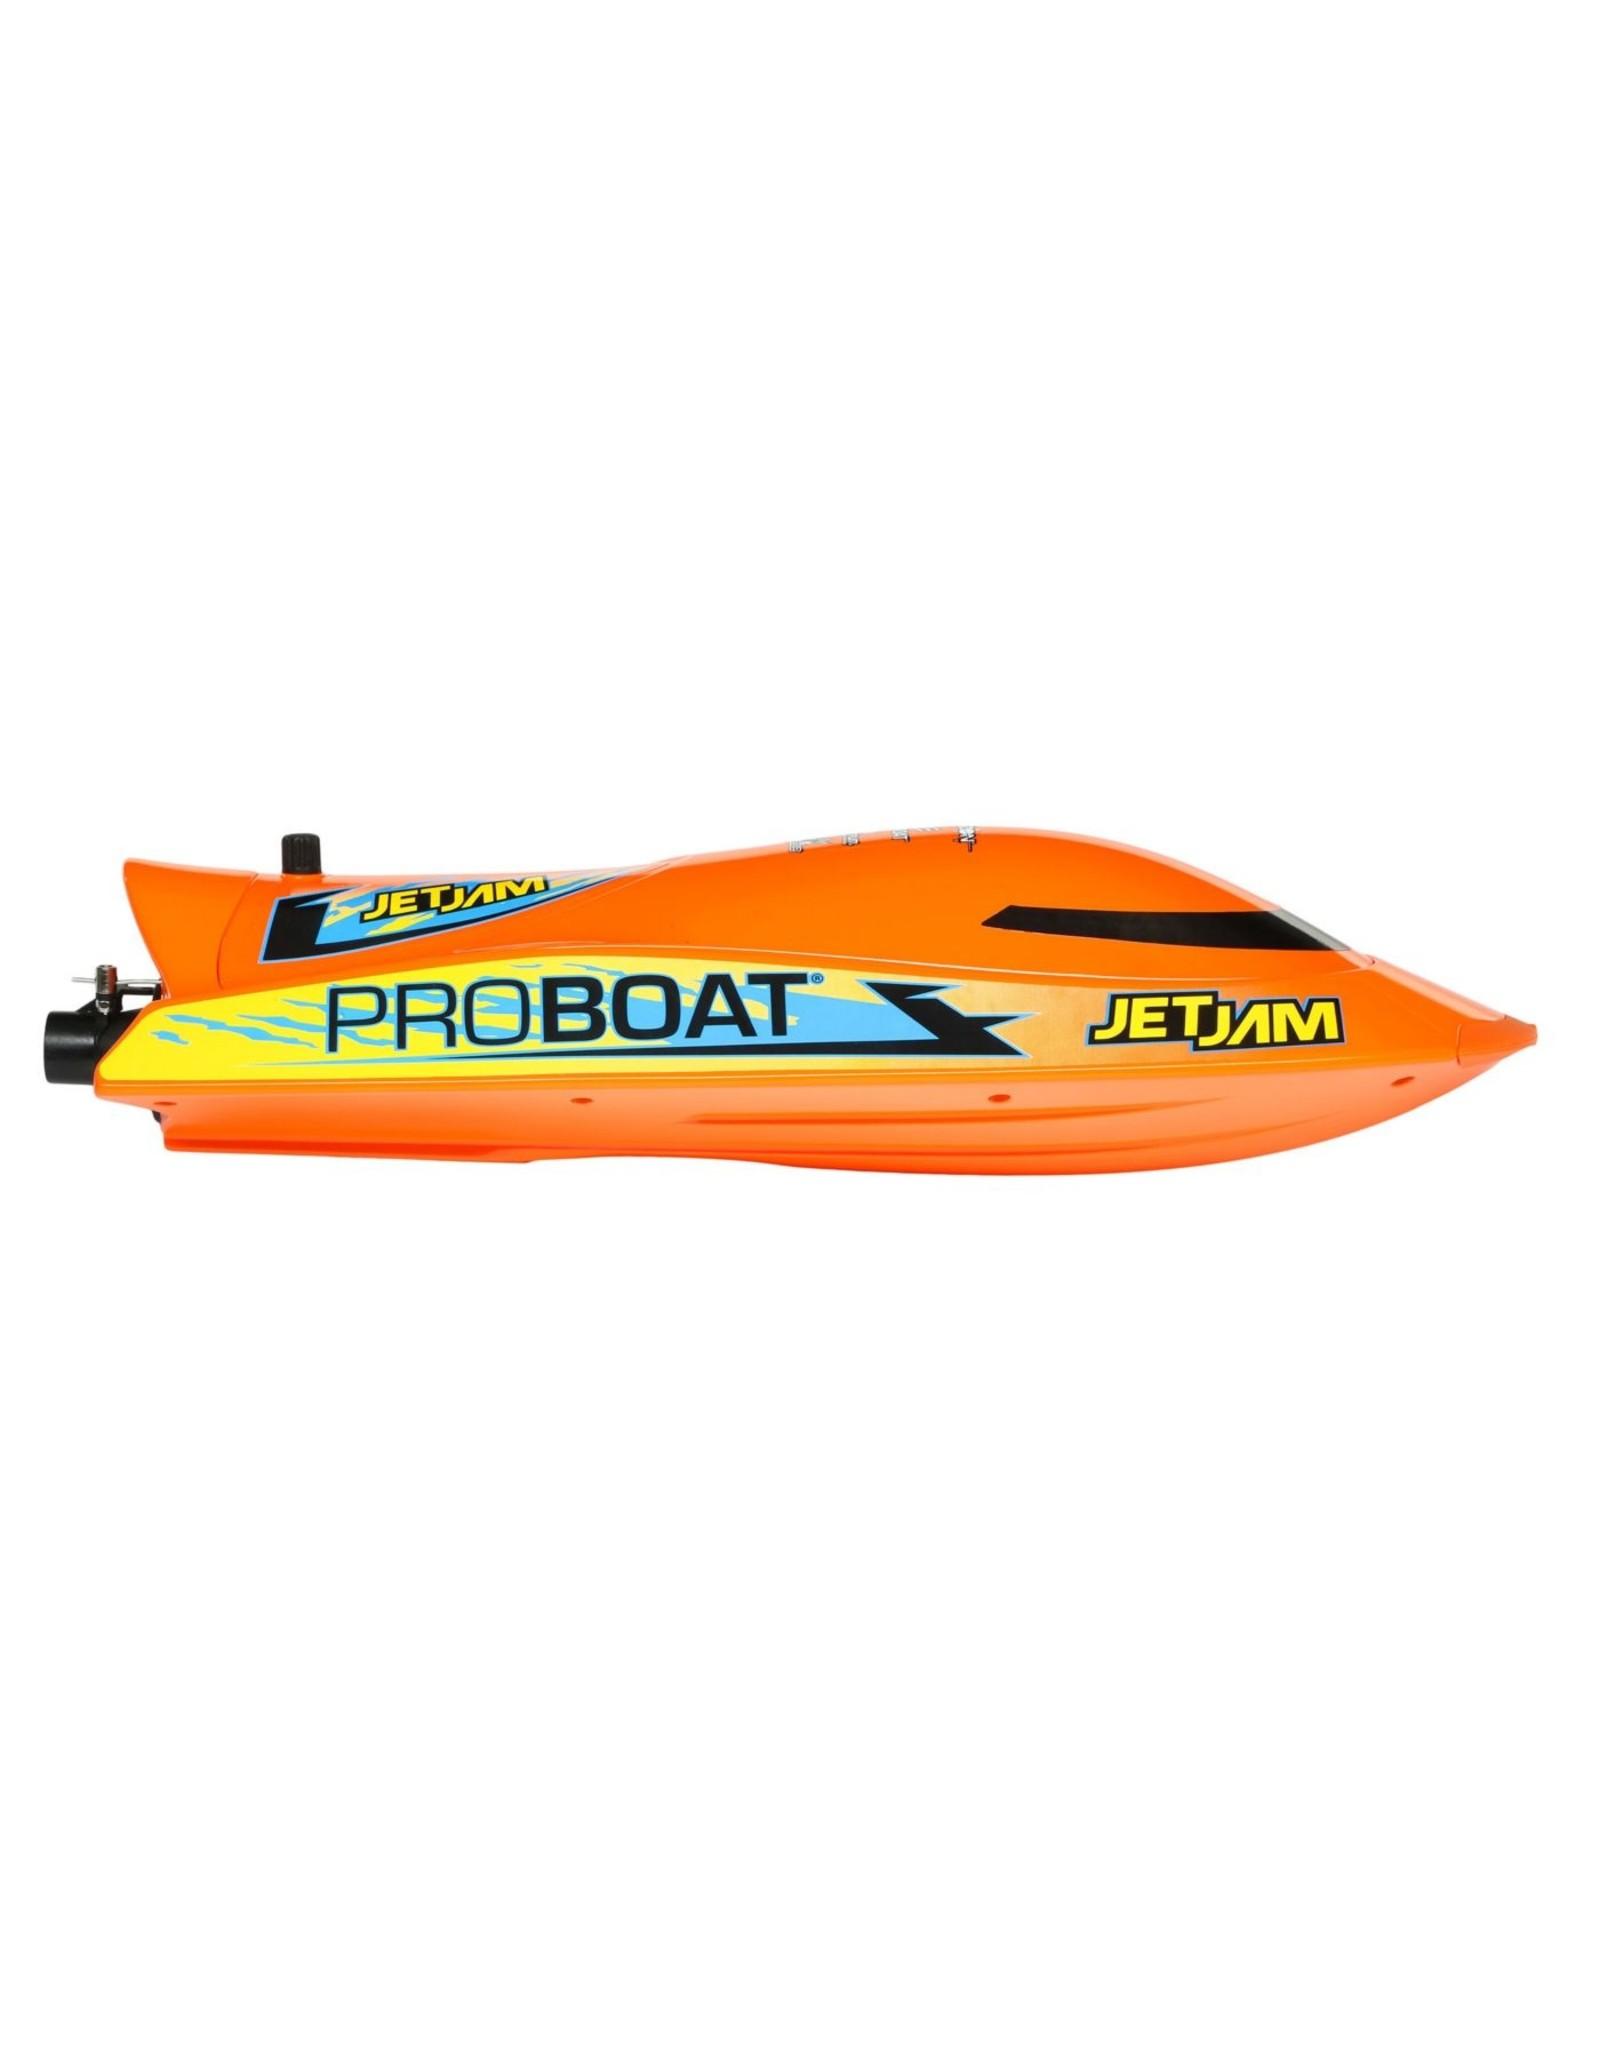 "PROBOAT PRB18019 USB Charger Jet Jam 12/"" Pool Racer RTR"